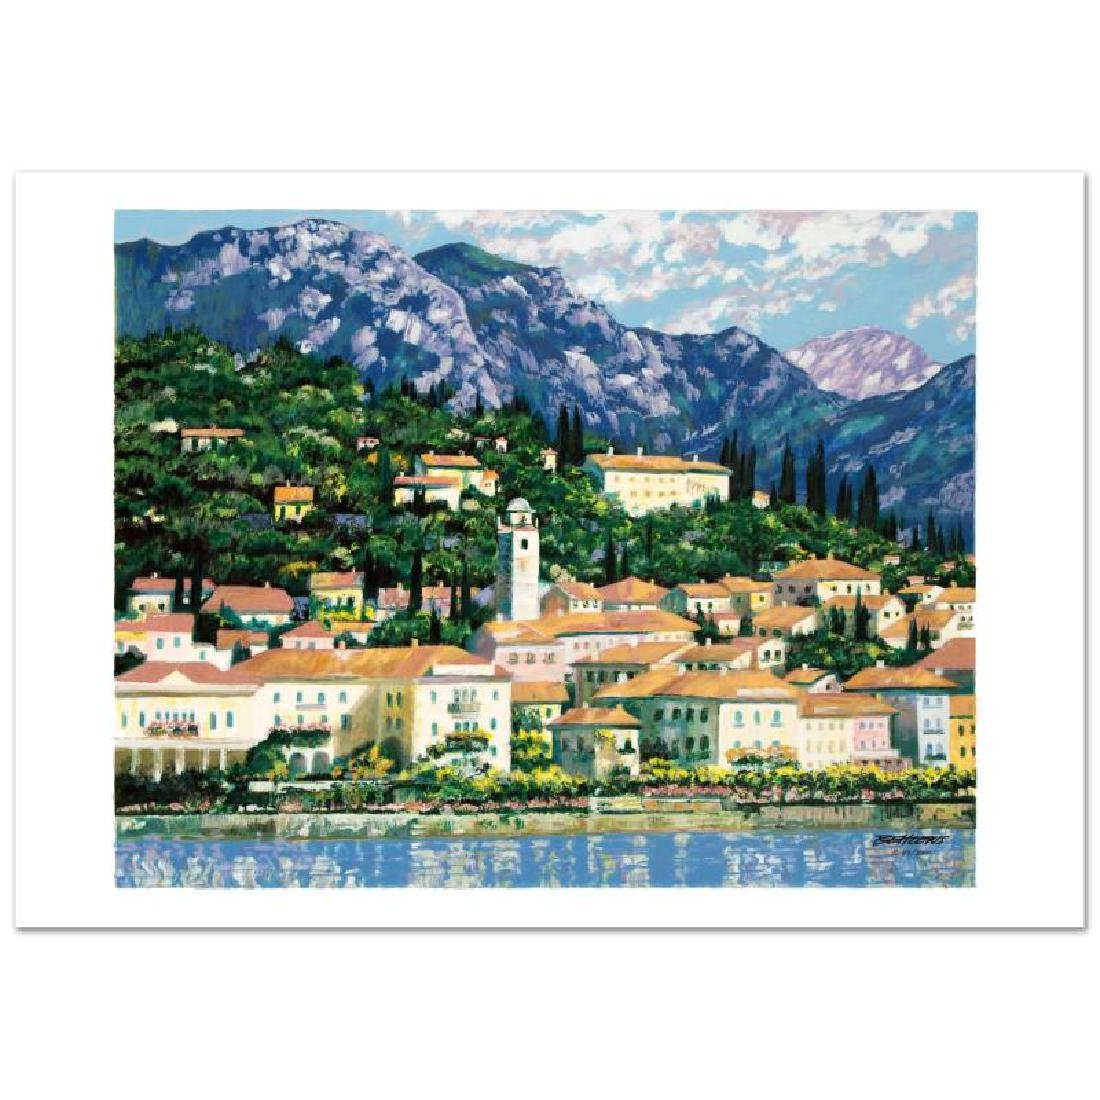 Bellagio Hillside Limited Edition Serigraph by Howard